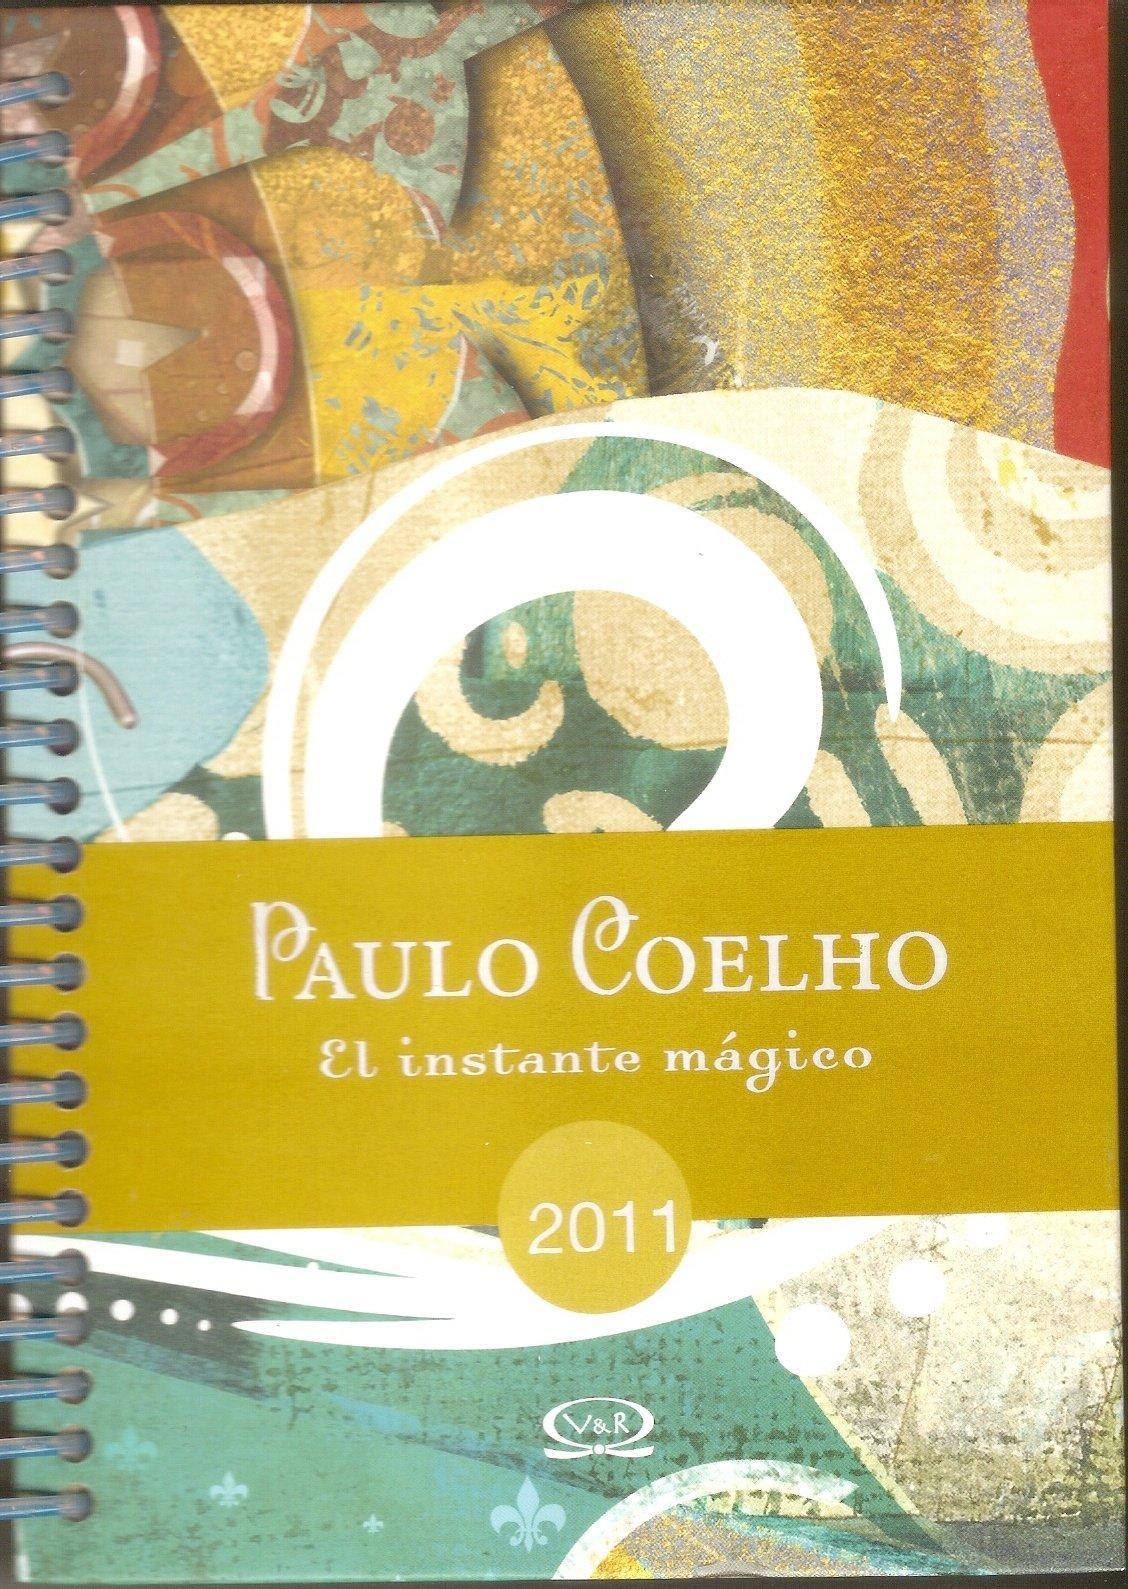 AGENDA 2011 PAULO COELHO: Paulo Coelho: Amazon.com: Books